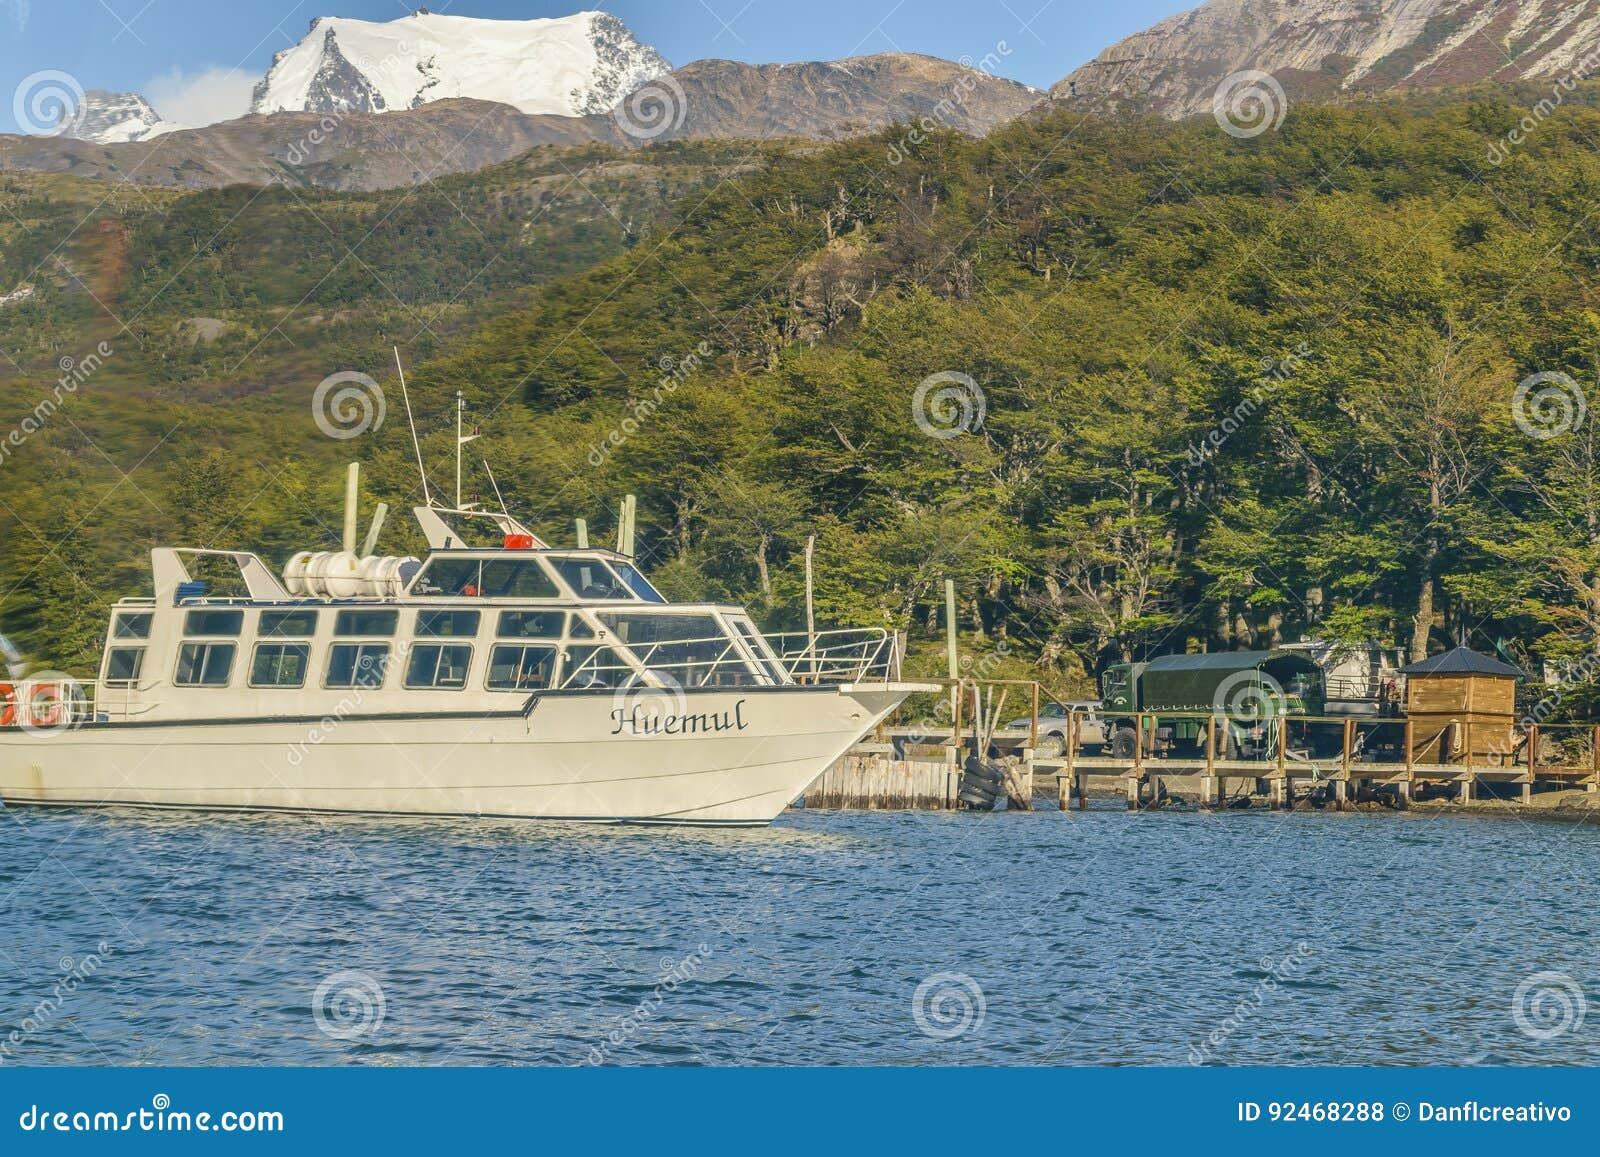 Parkerat fartyg, Lago del Desierto, Patagonia - Argentina